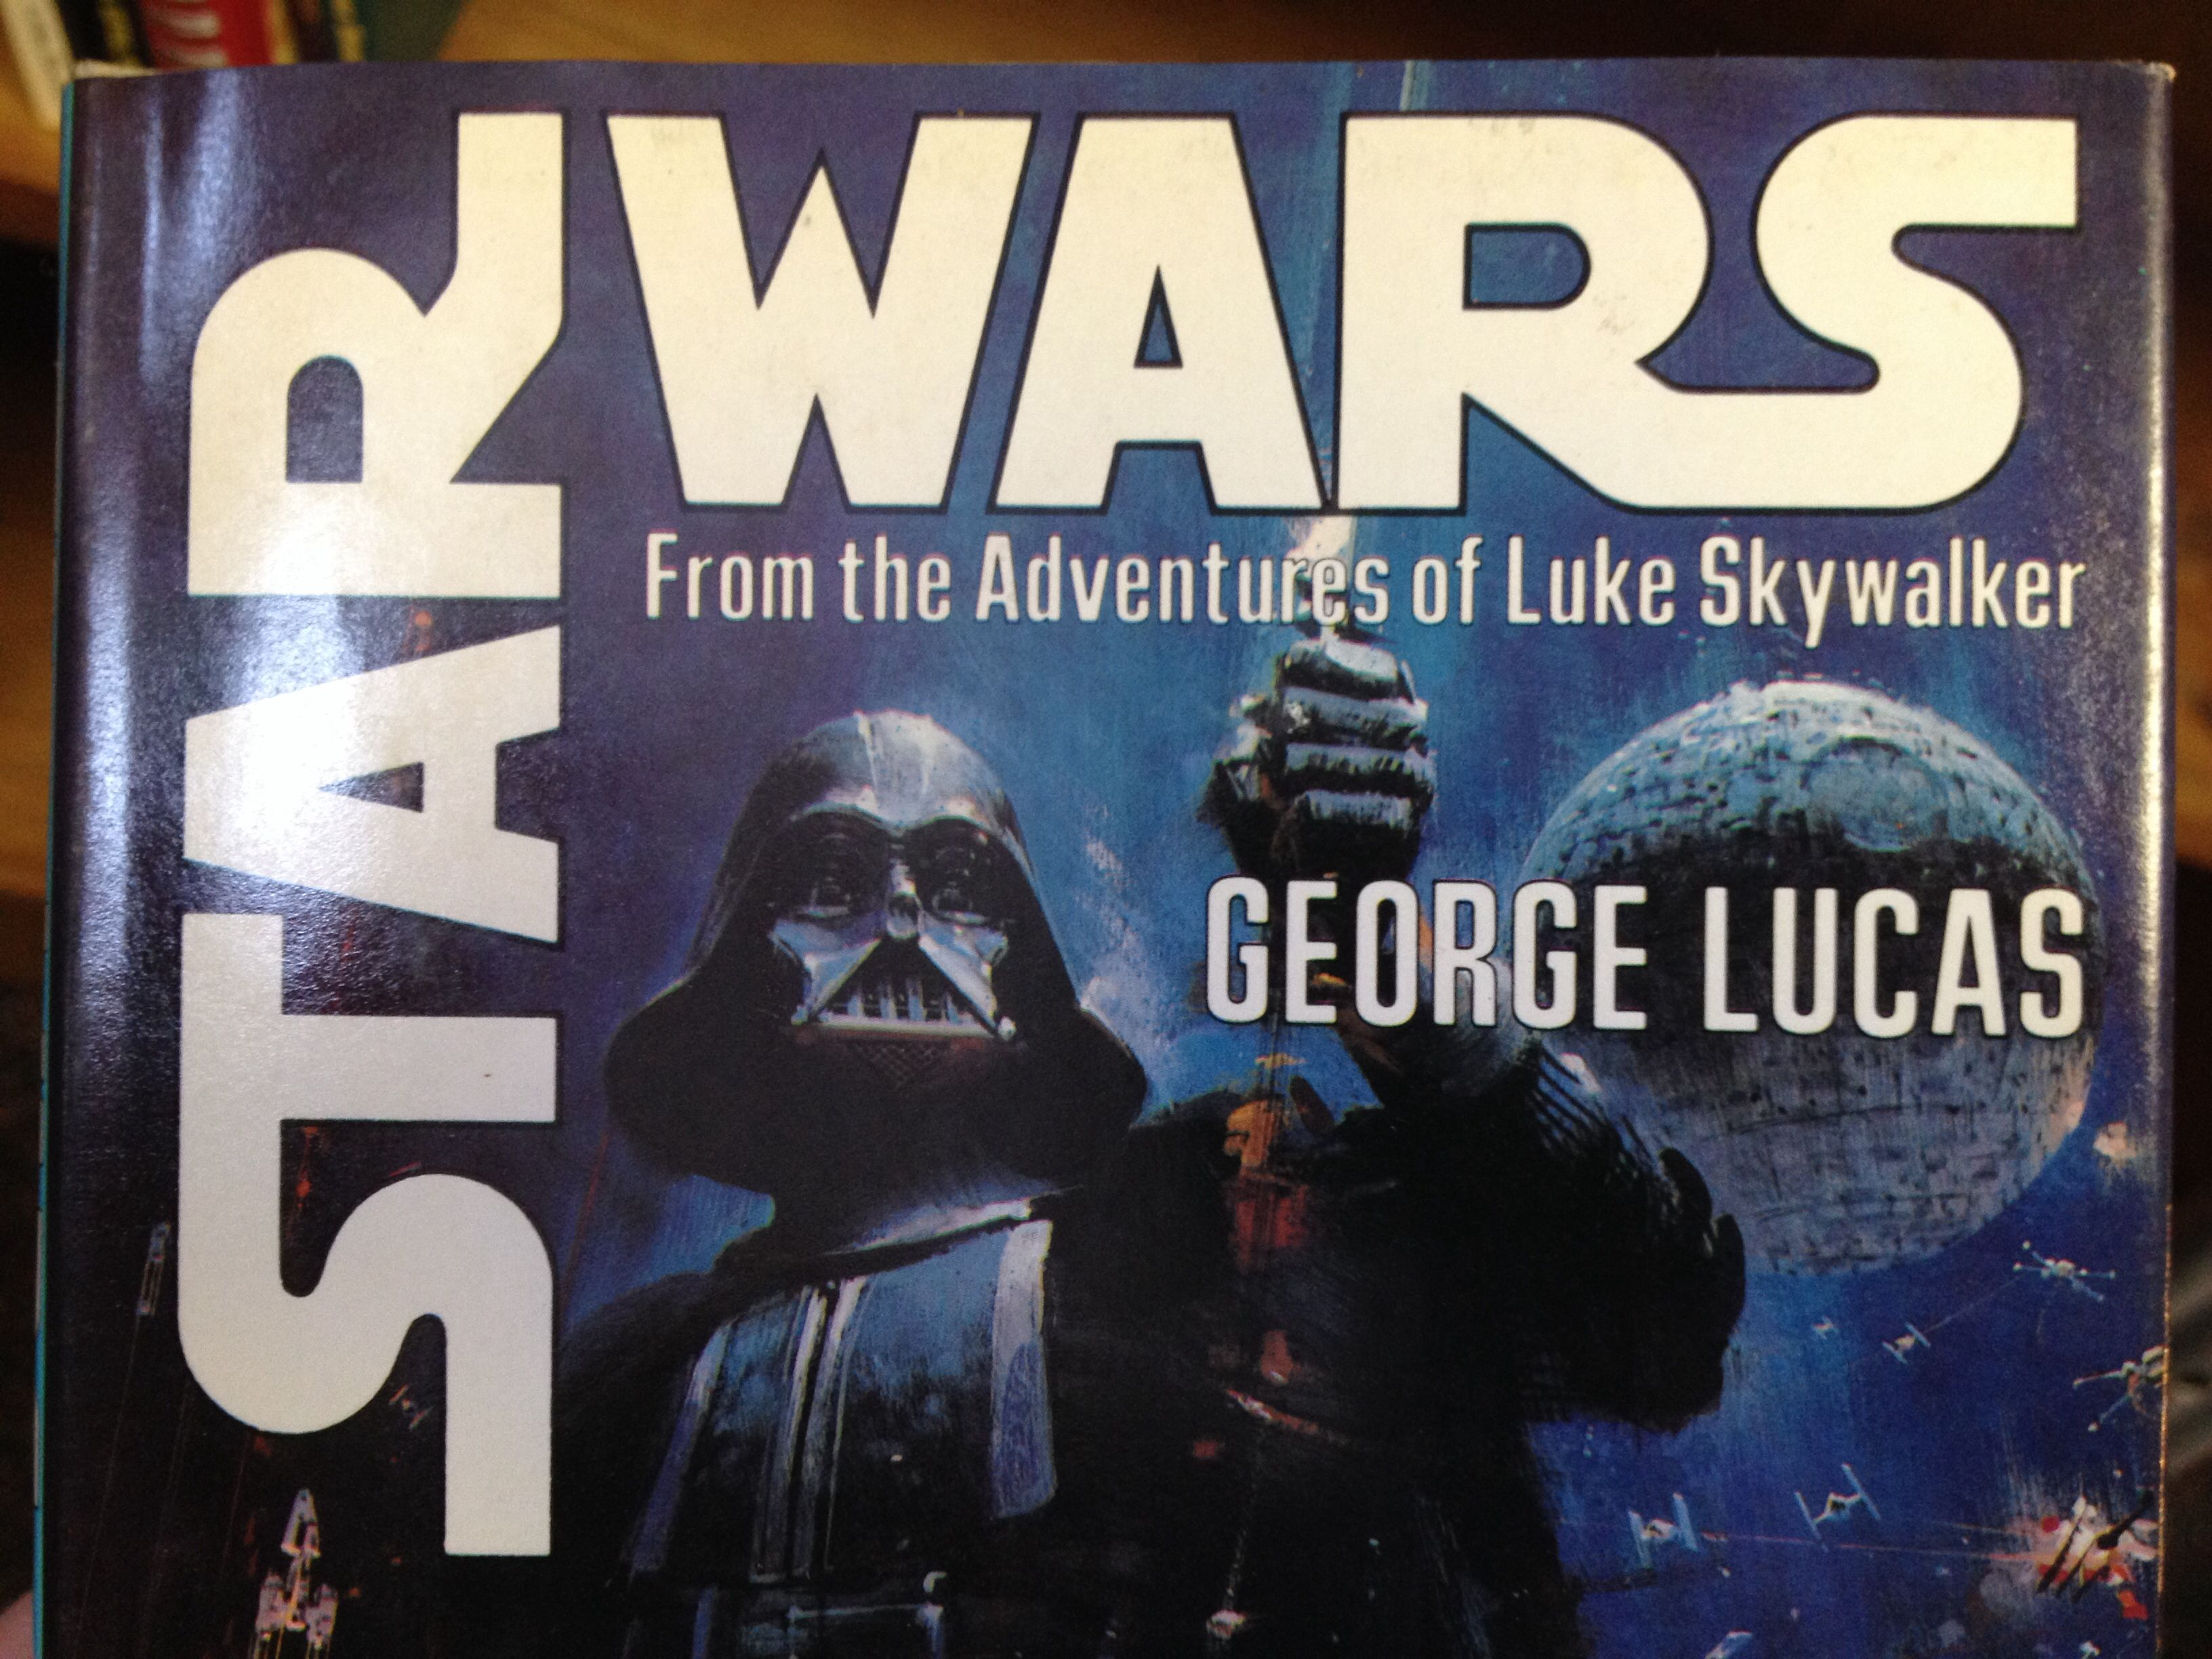 Original publishing 1977